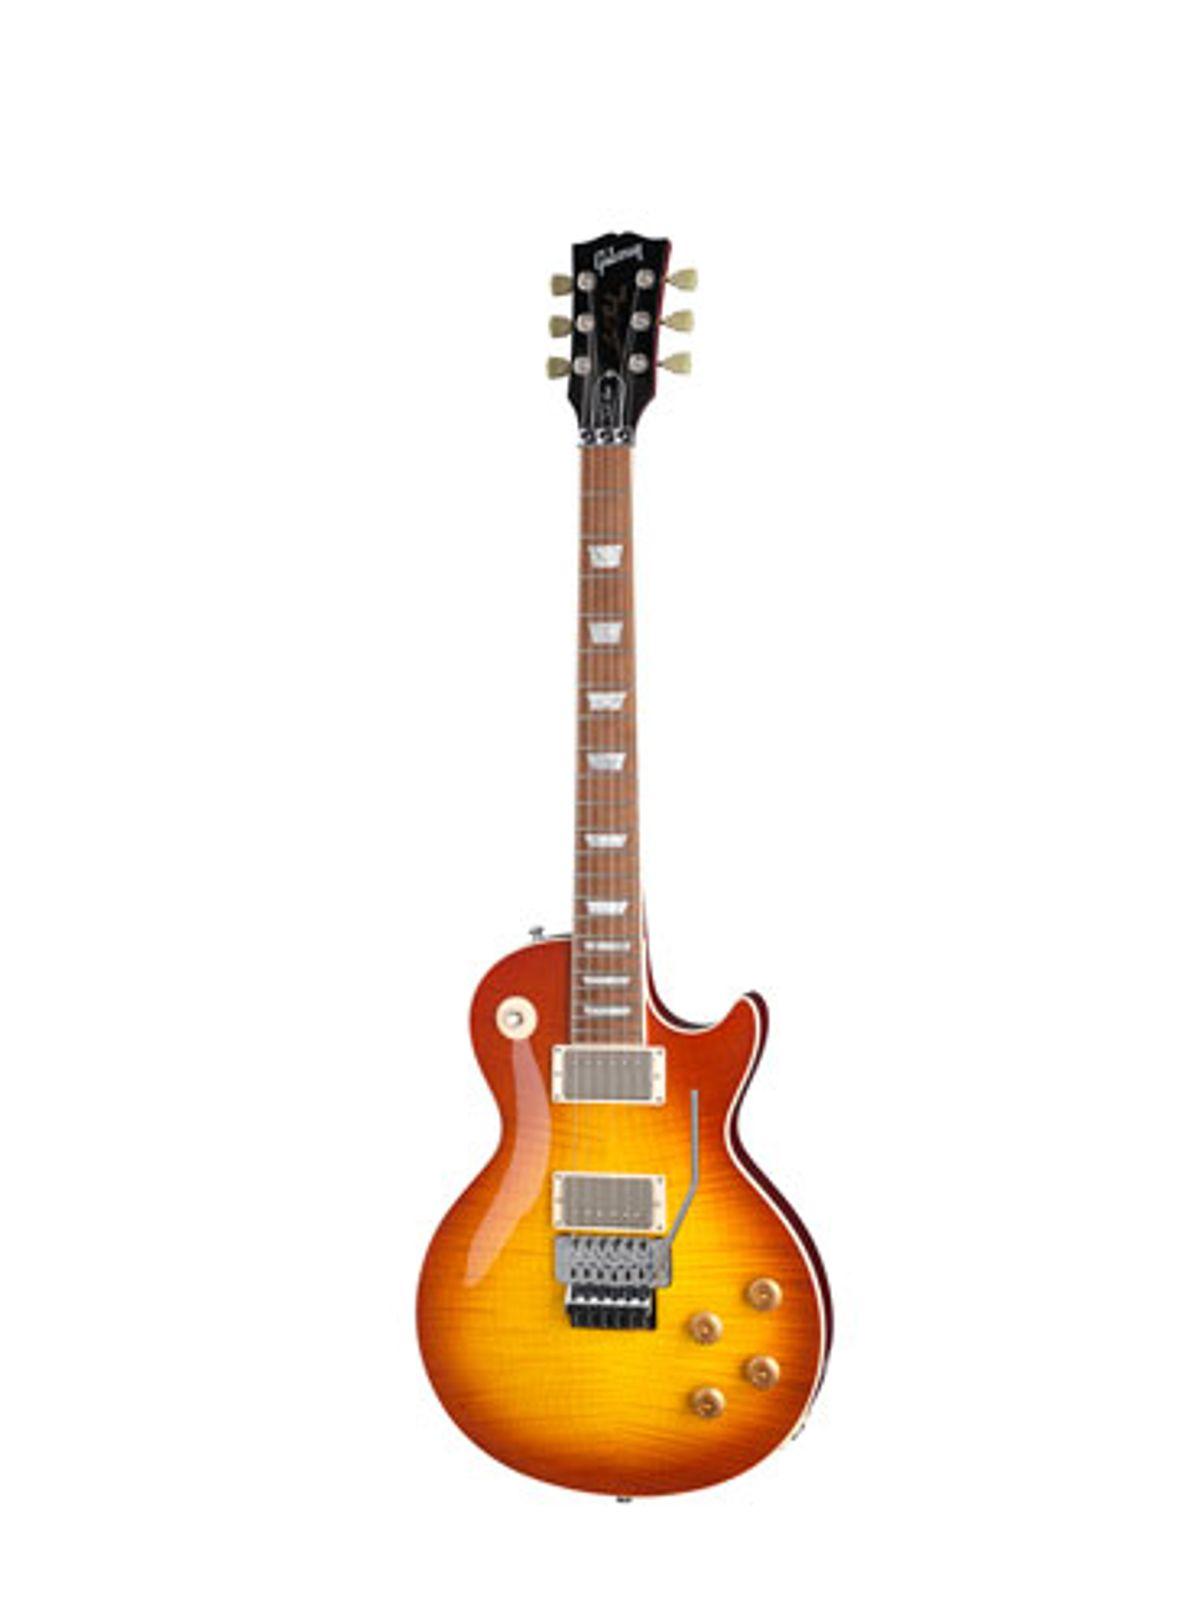 Gibson Announces Custom Shop Dave Amato Les Paul Axcess Standard